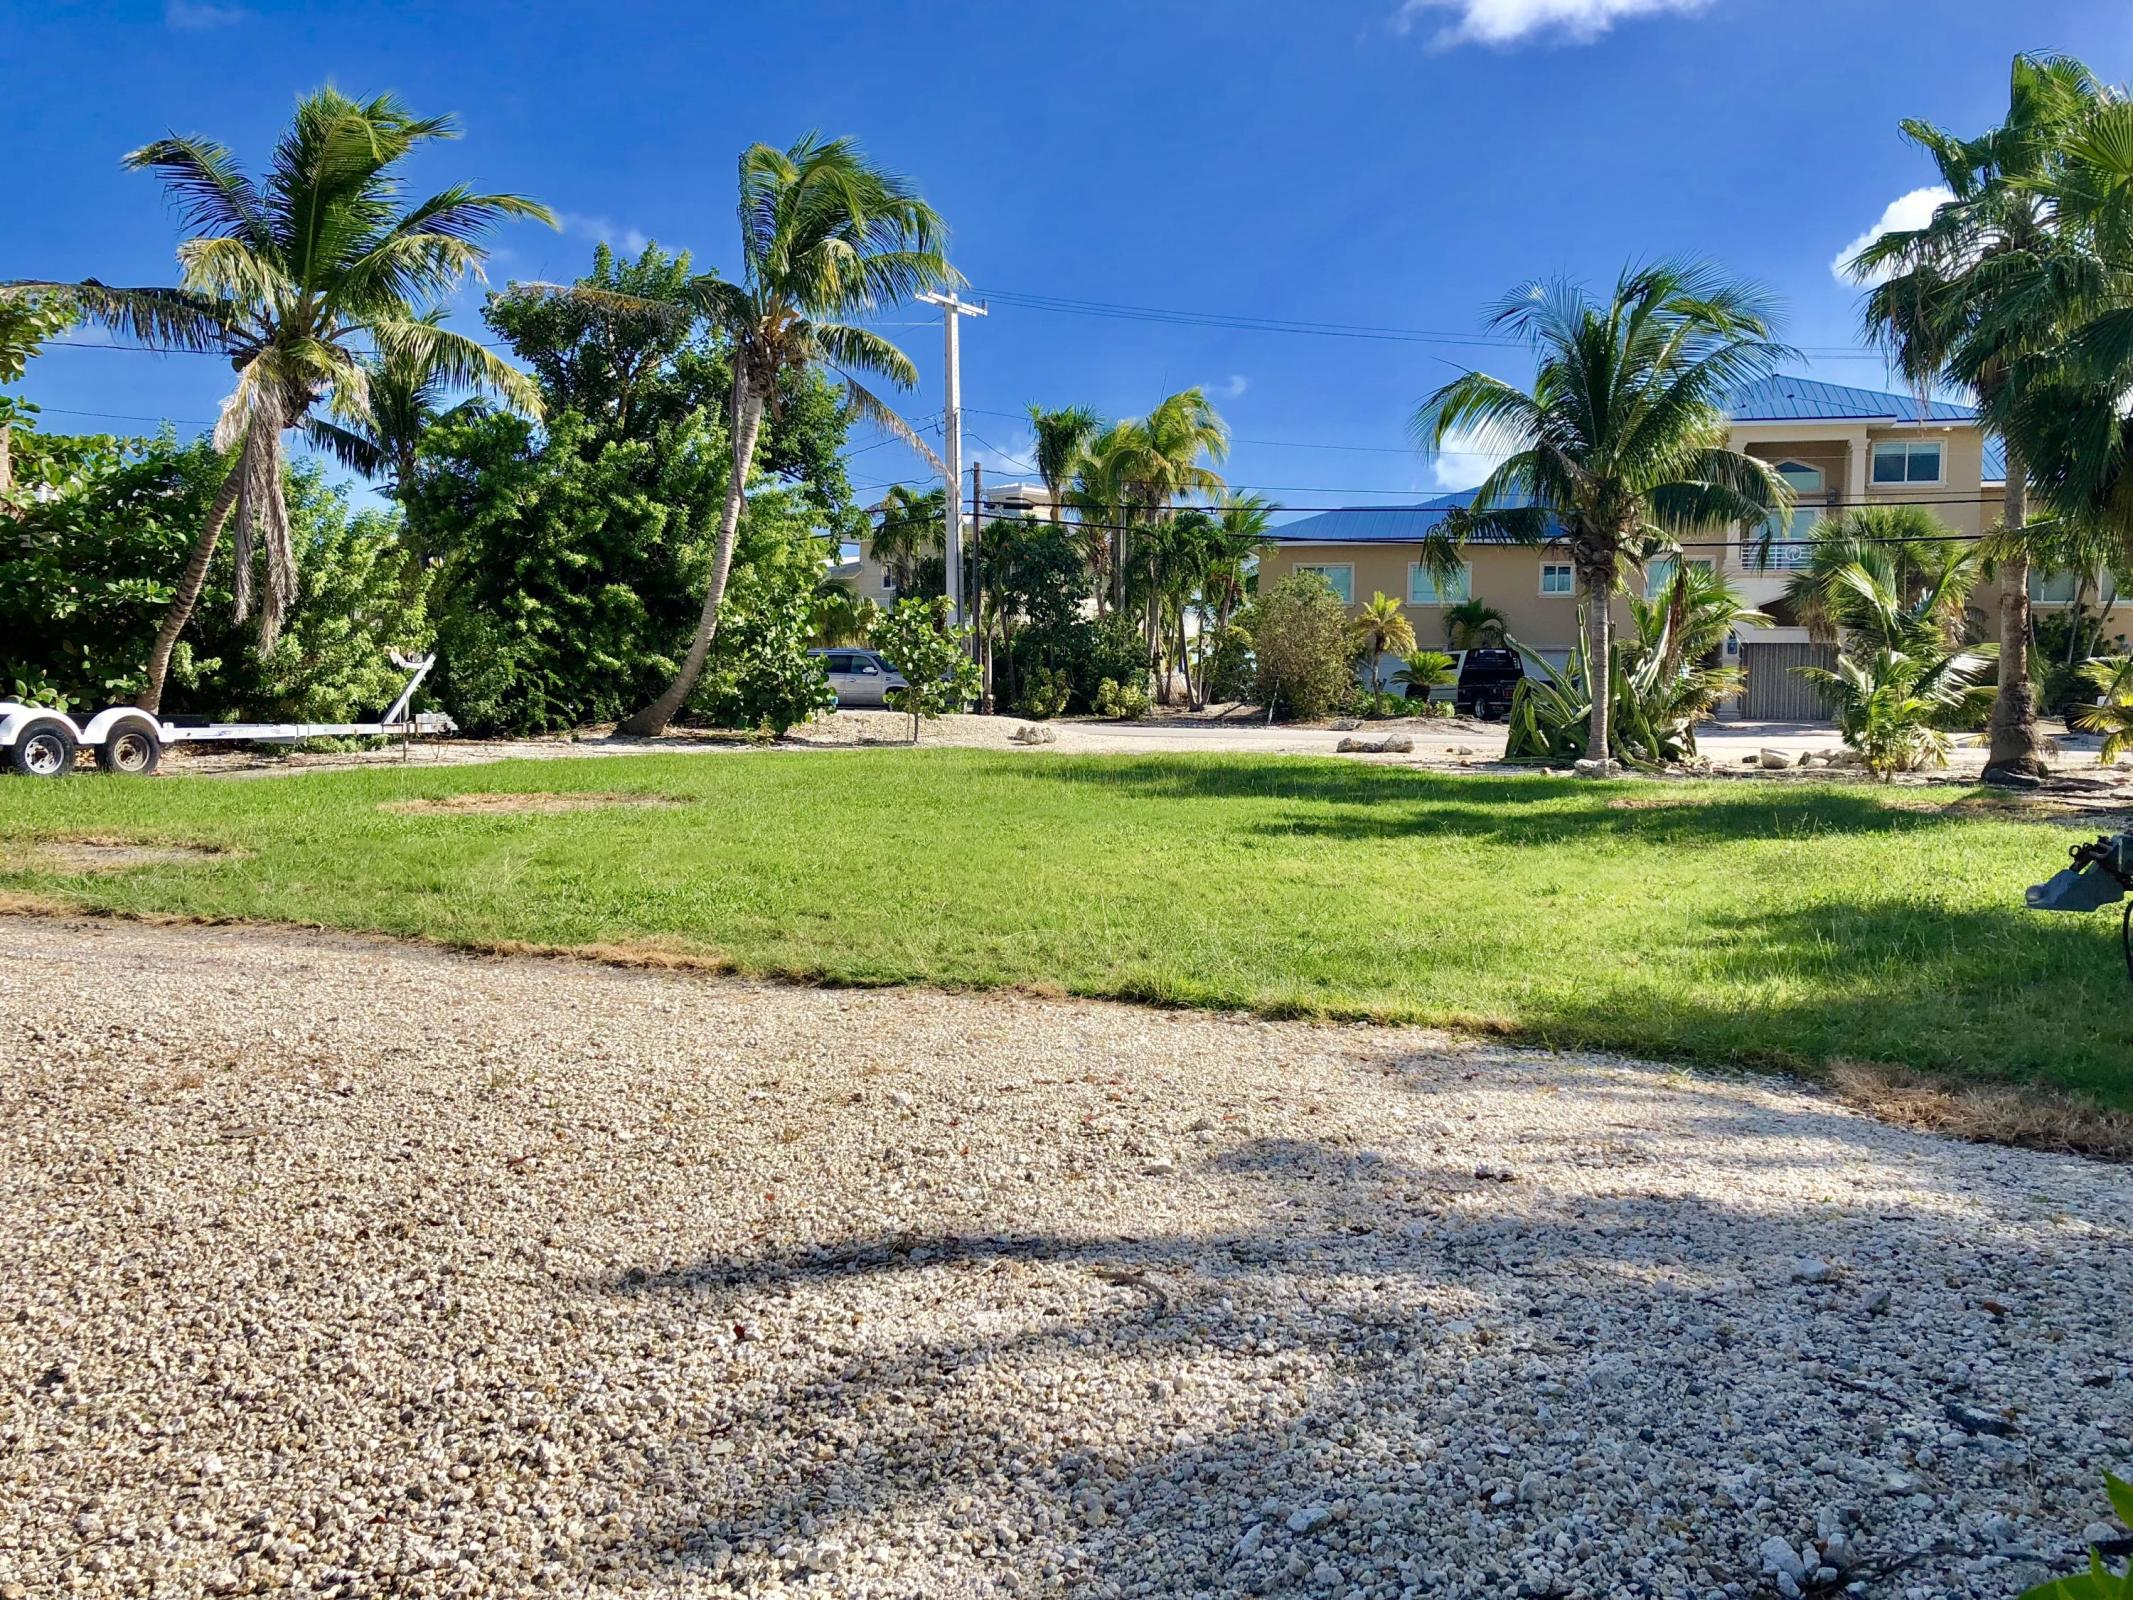 Caribbean Drive